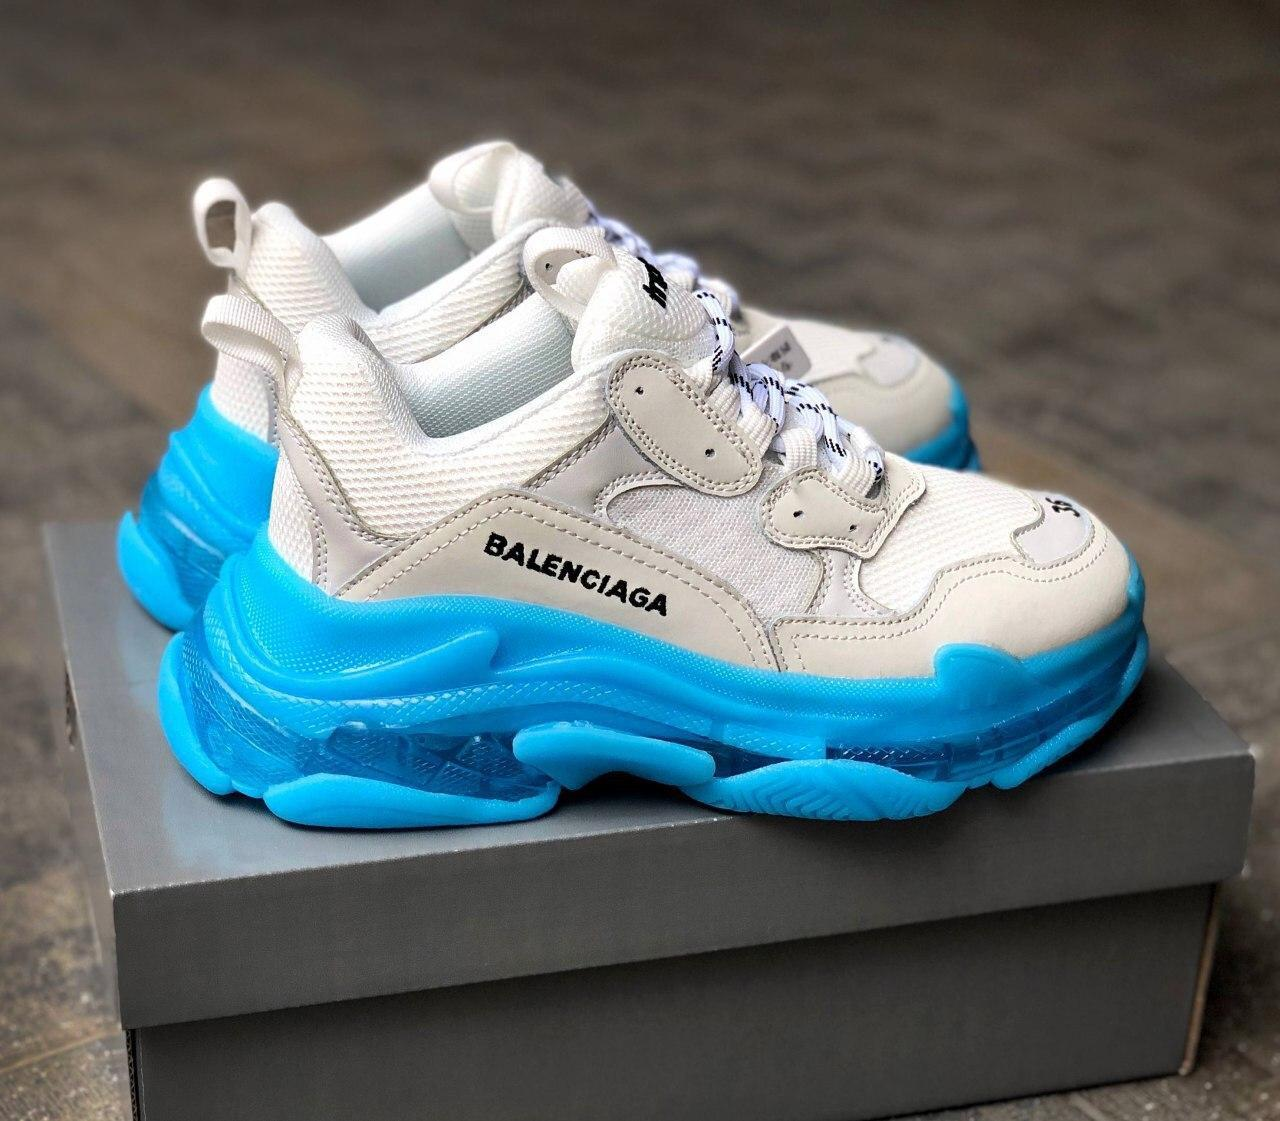 Женские кроссовки Balenciaga Triple S Blue Ocean / Баленсиага